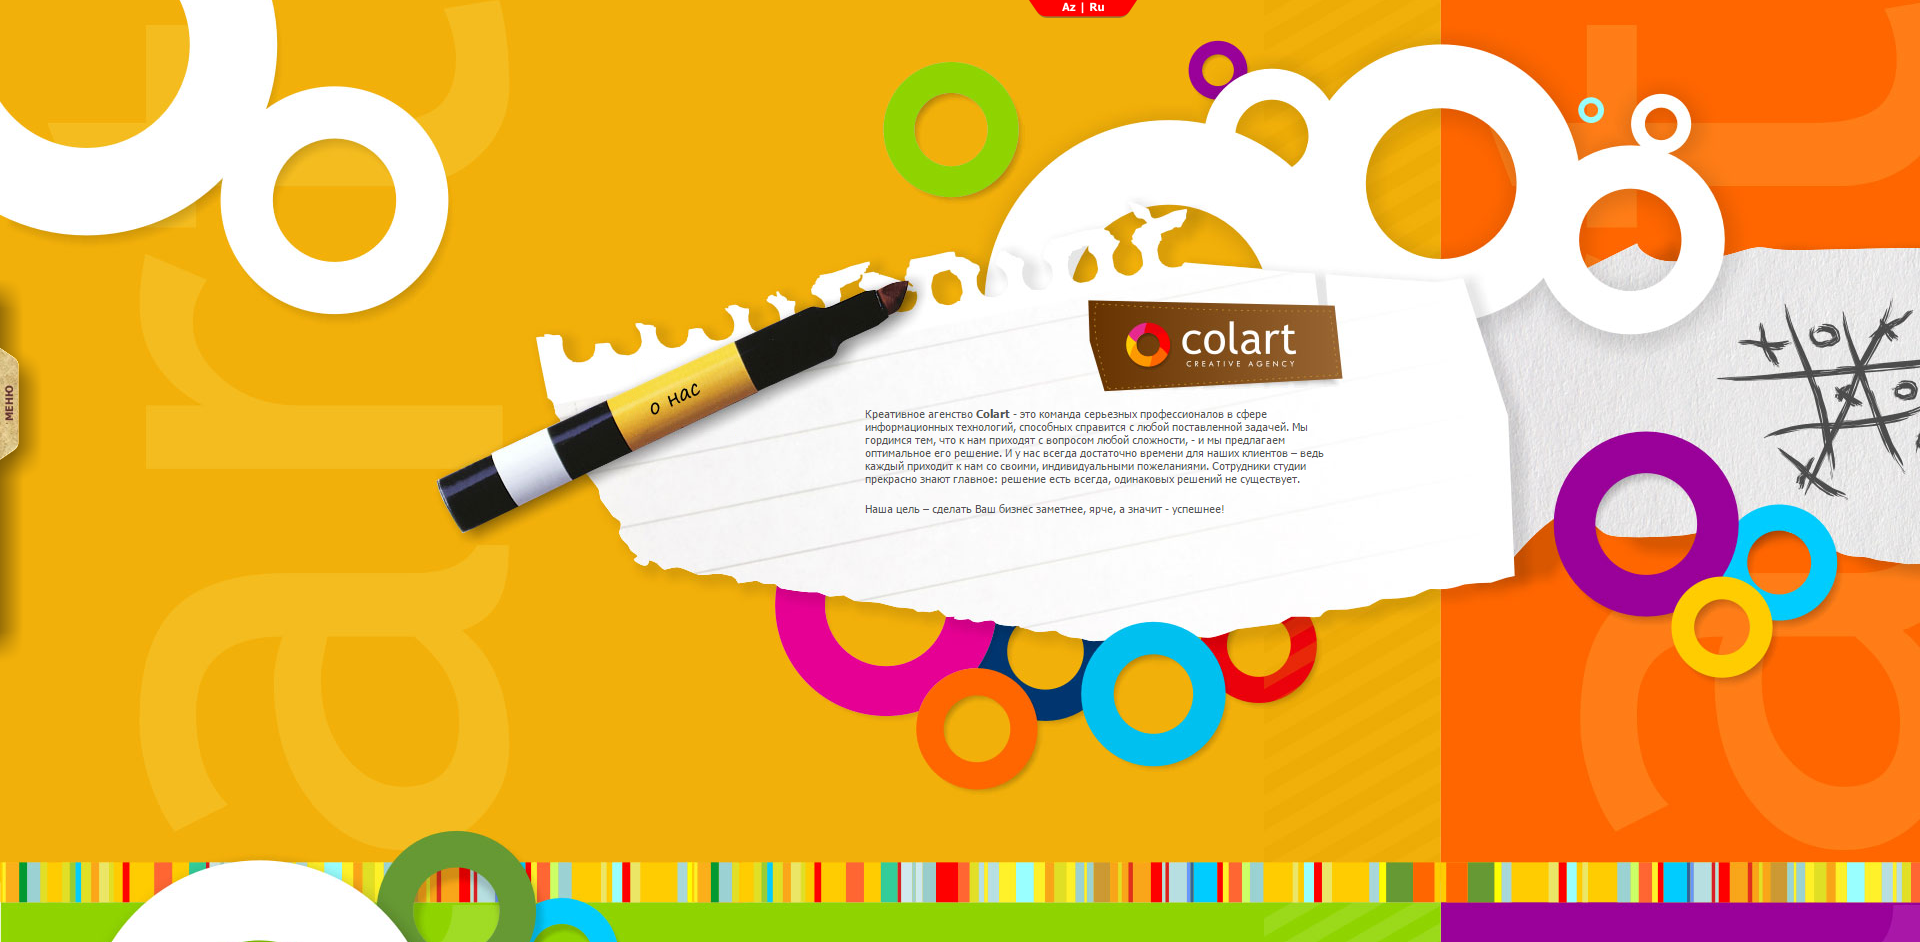 Colart screenshot